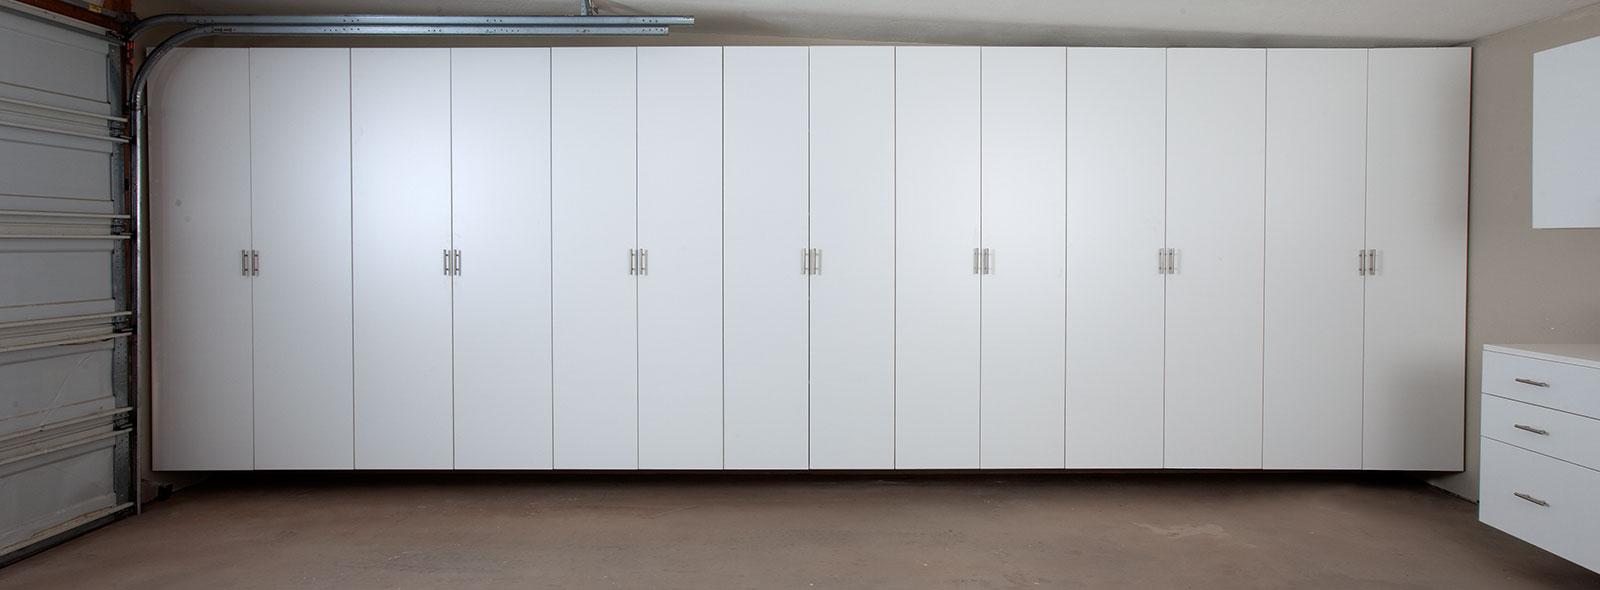 Matte Garage Cabinets Silver Finish White Finish